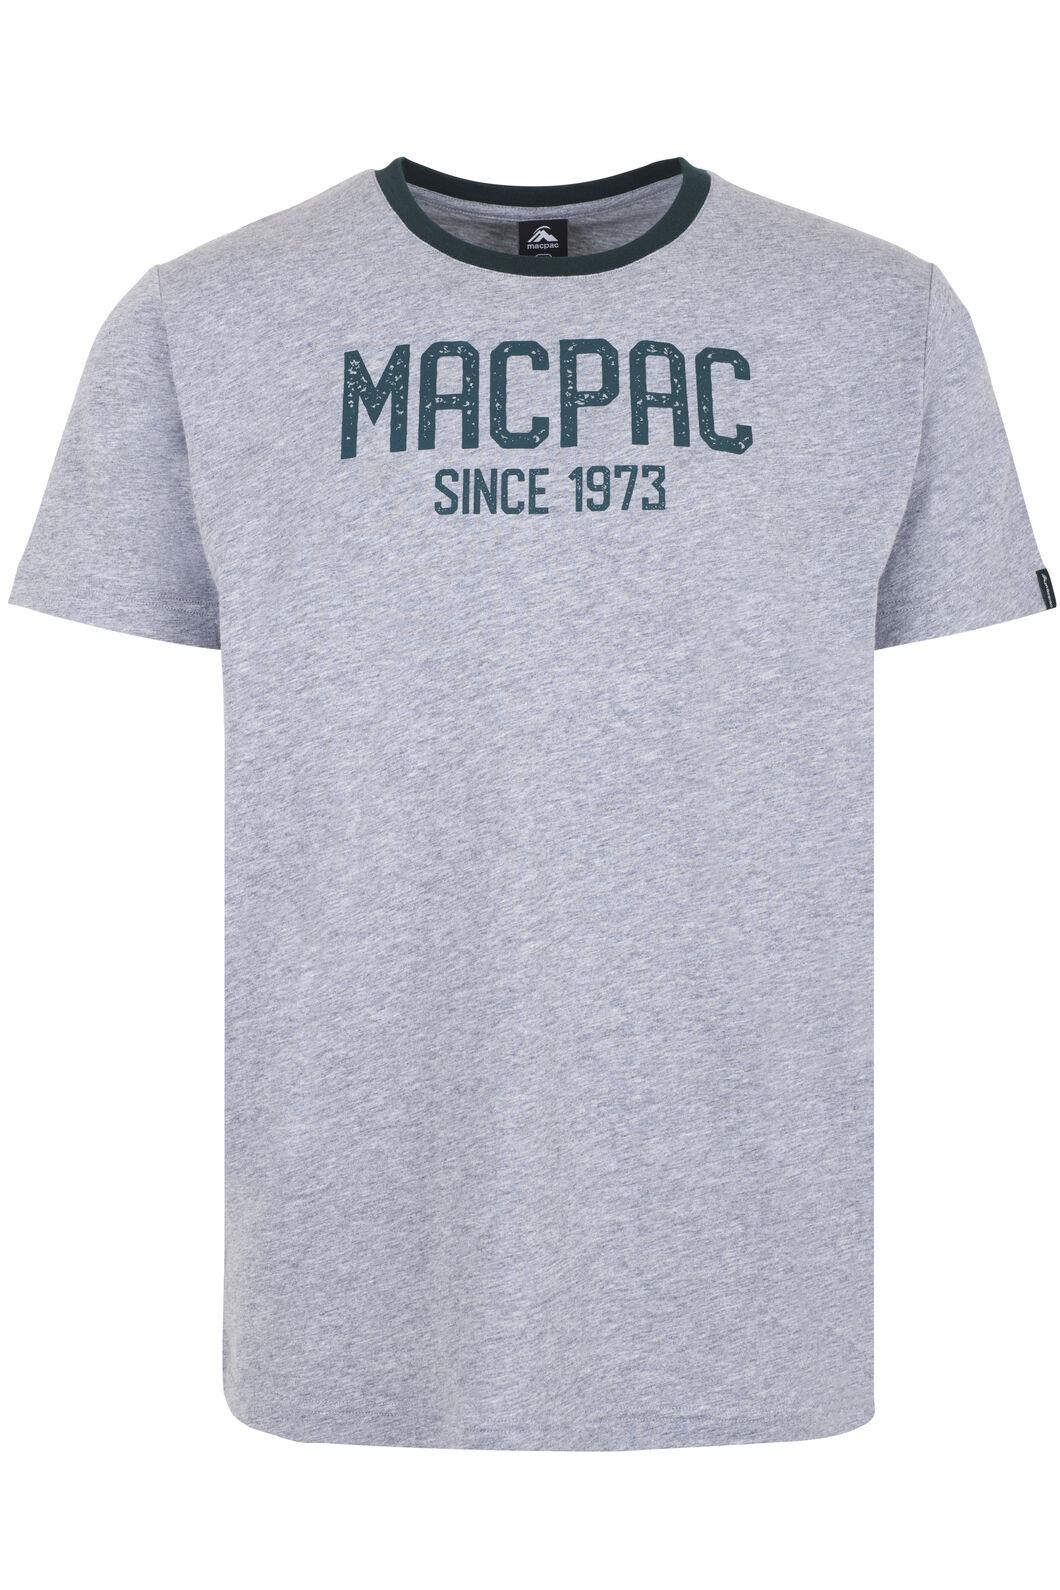 Macpac Freshman Organic Cotton Tee - Men's, Mid Grey Marle/Ponderosa, hi-res